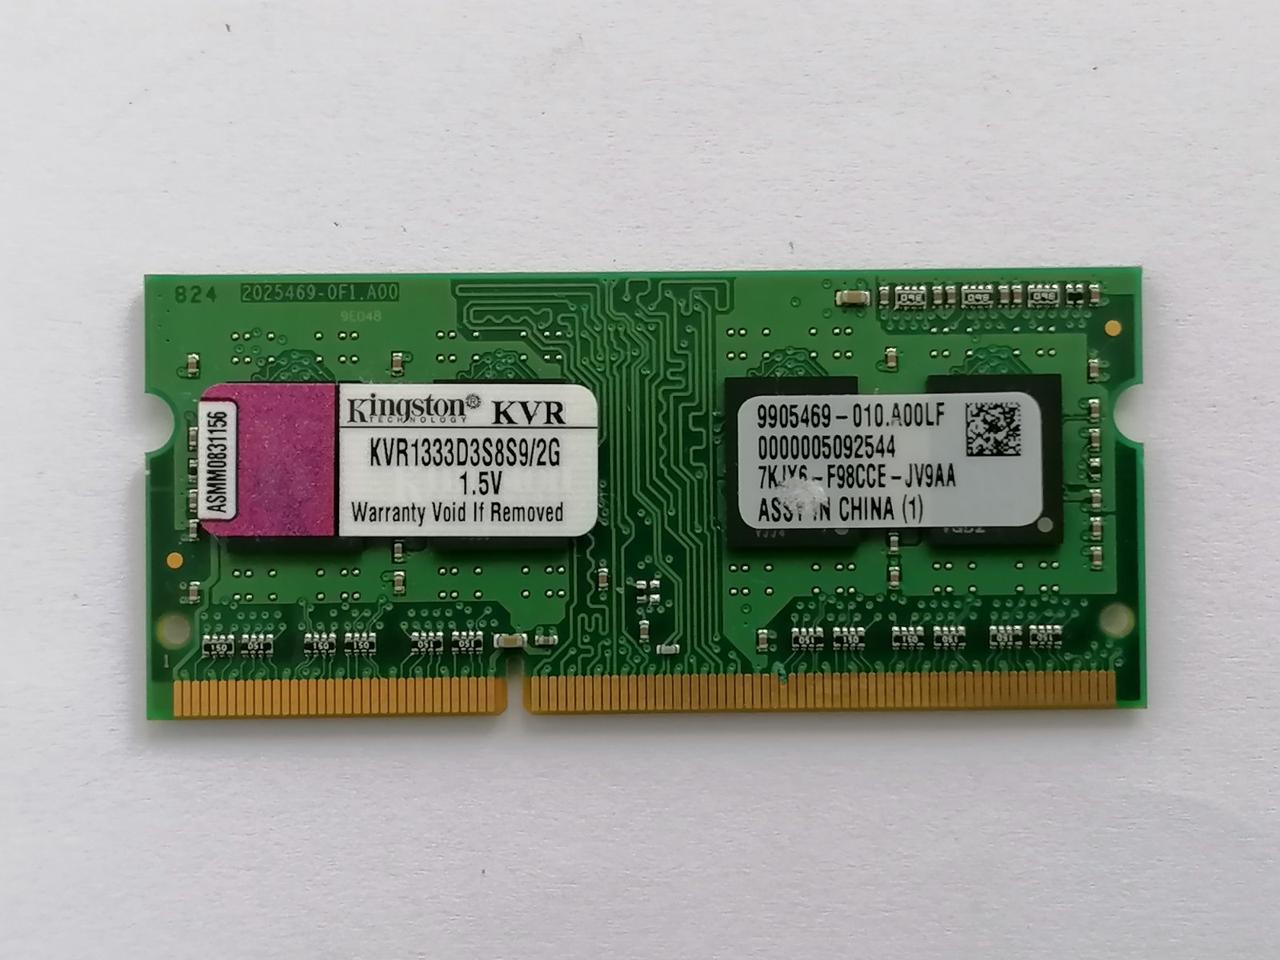 Оперативная память Kingston SODIMM  DDR3-1333, 2GB, PC3-10600 - KVR1333D3S8S9/2G